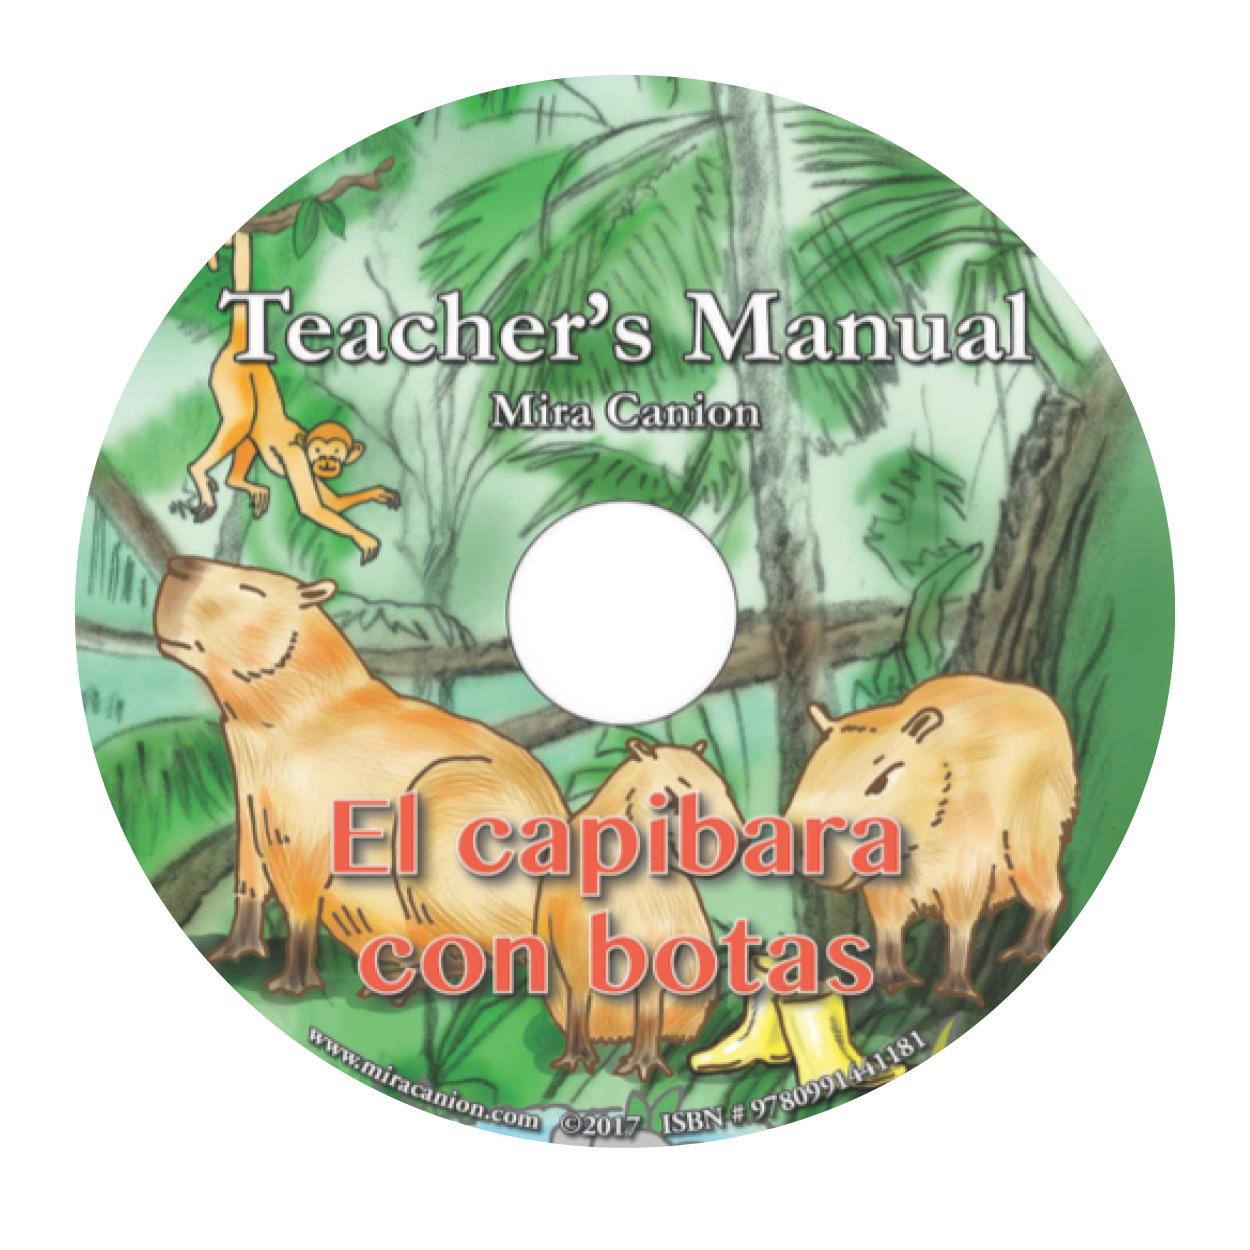 El Capibara con Botas - Teacher's Manual